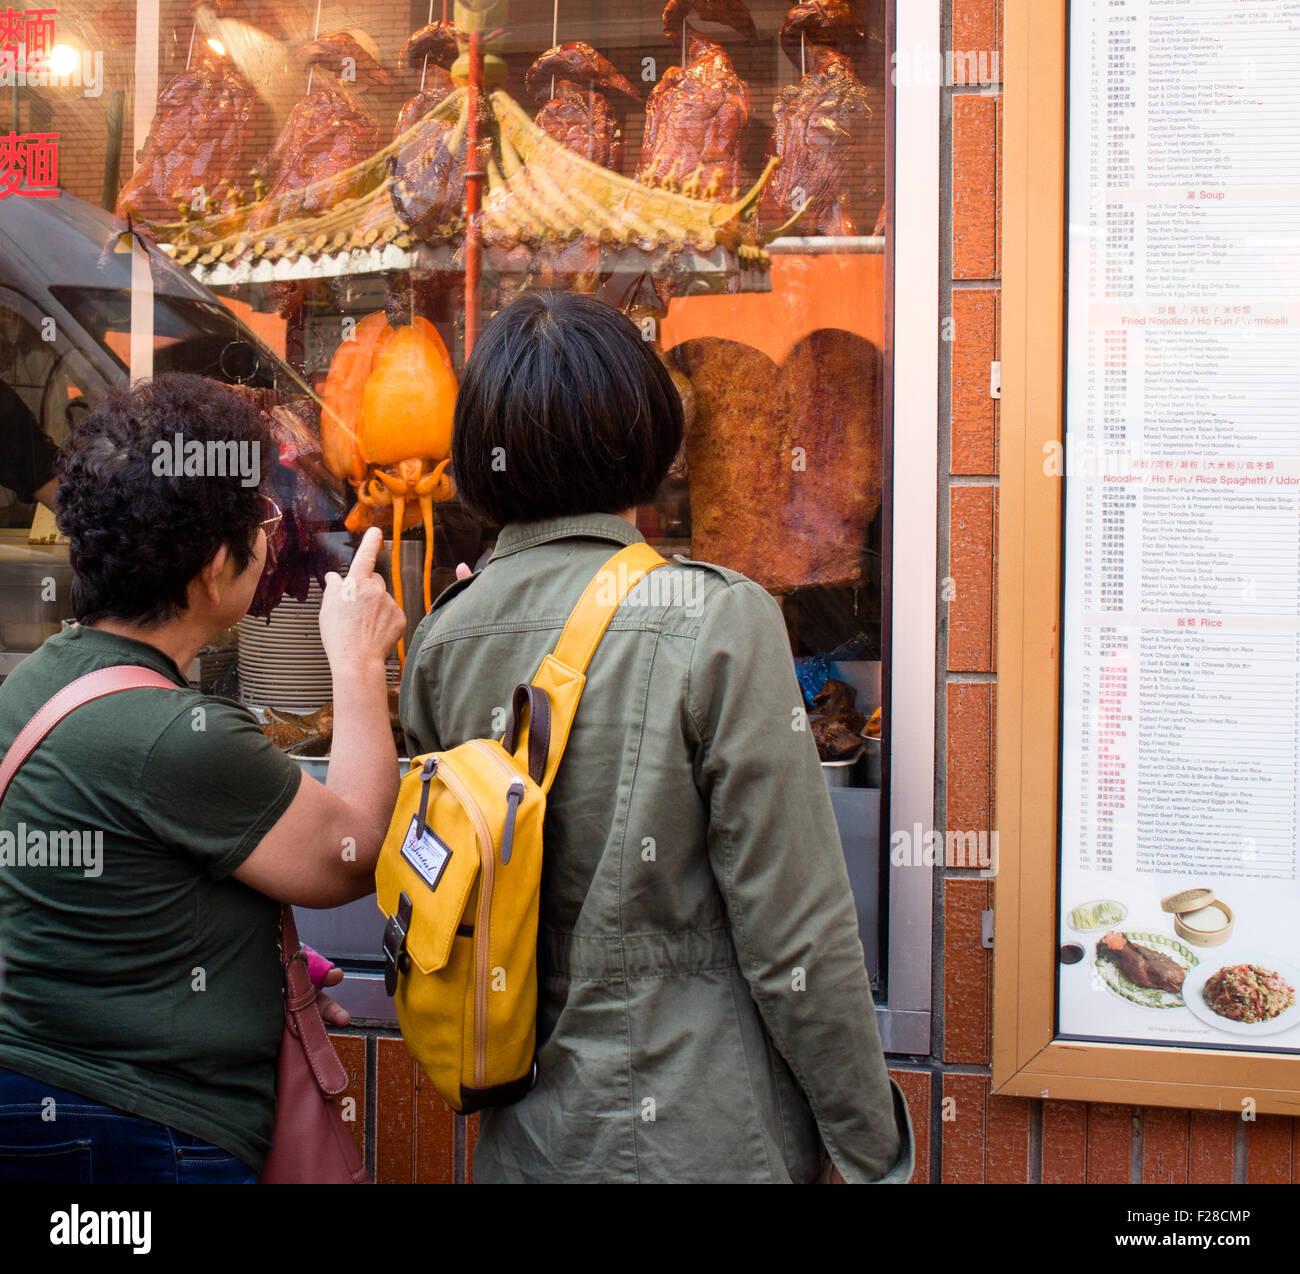 Chinese woman looking at crispy duck in restaurant window. Gerrard Street, London UK - Stock Image